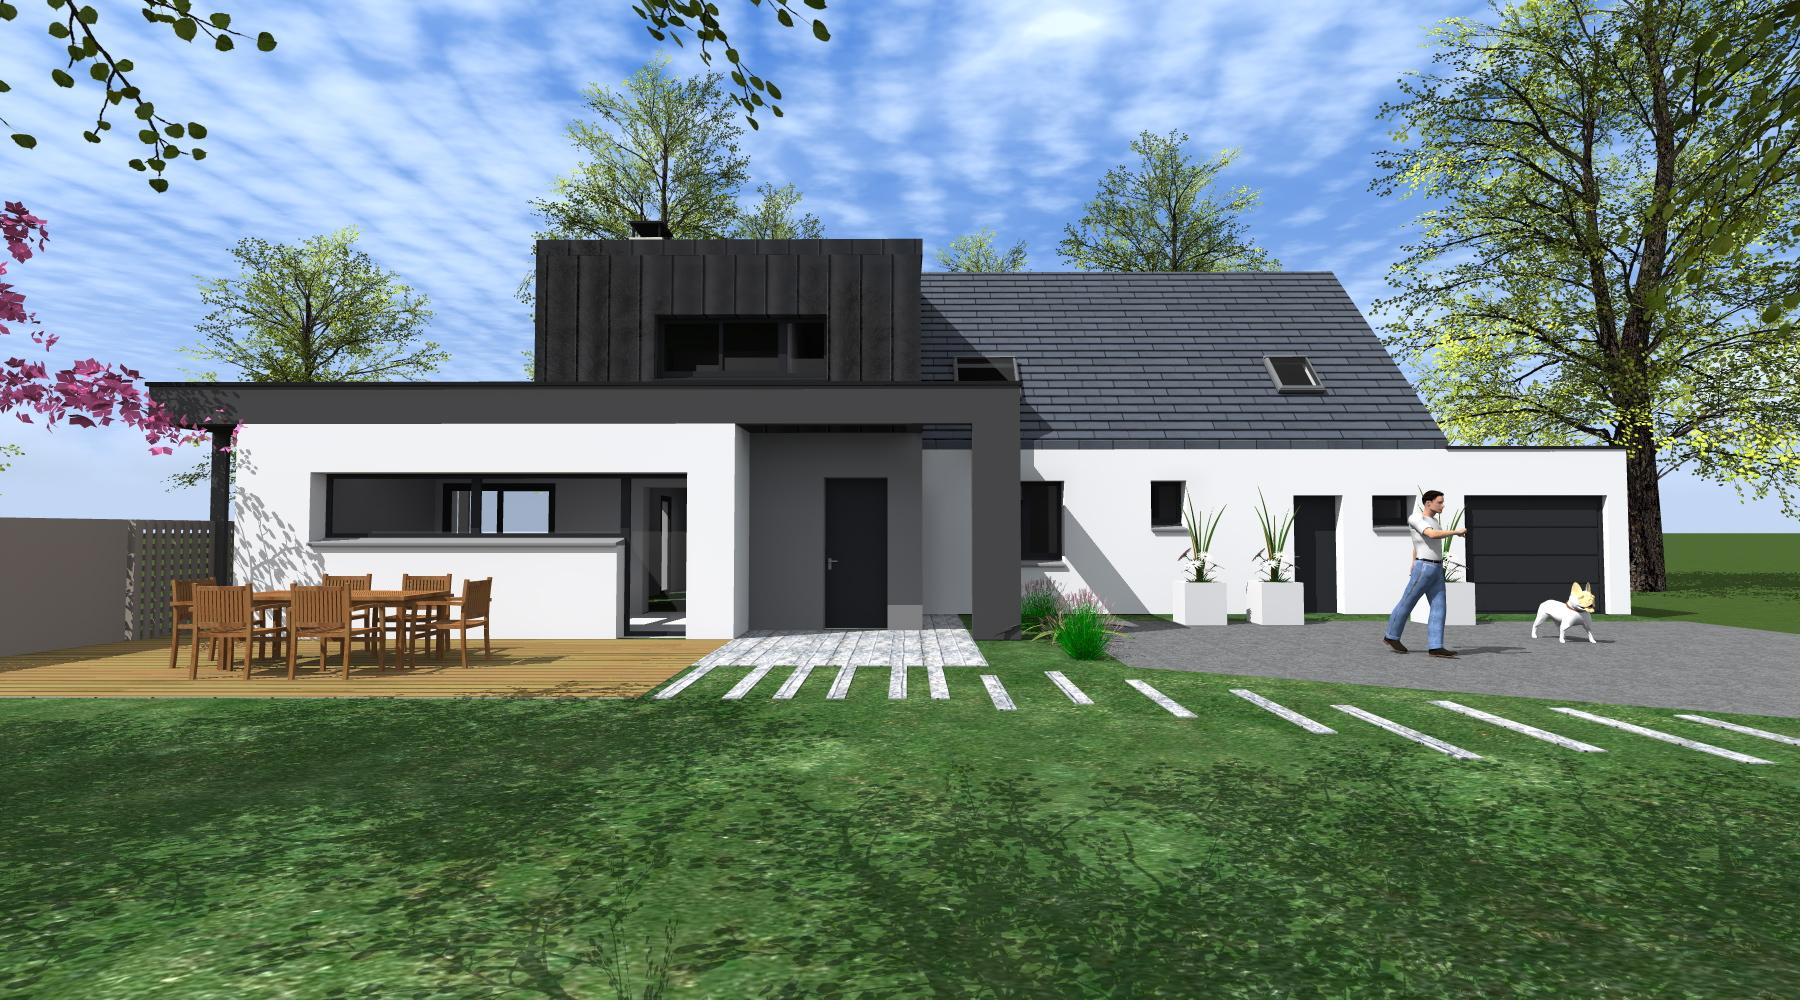 Projet g g 1 2 vue architecte lise roturier rennes for Agrandissement maison rennes